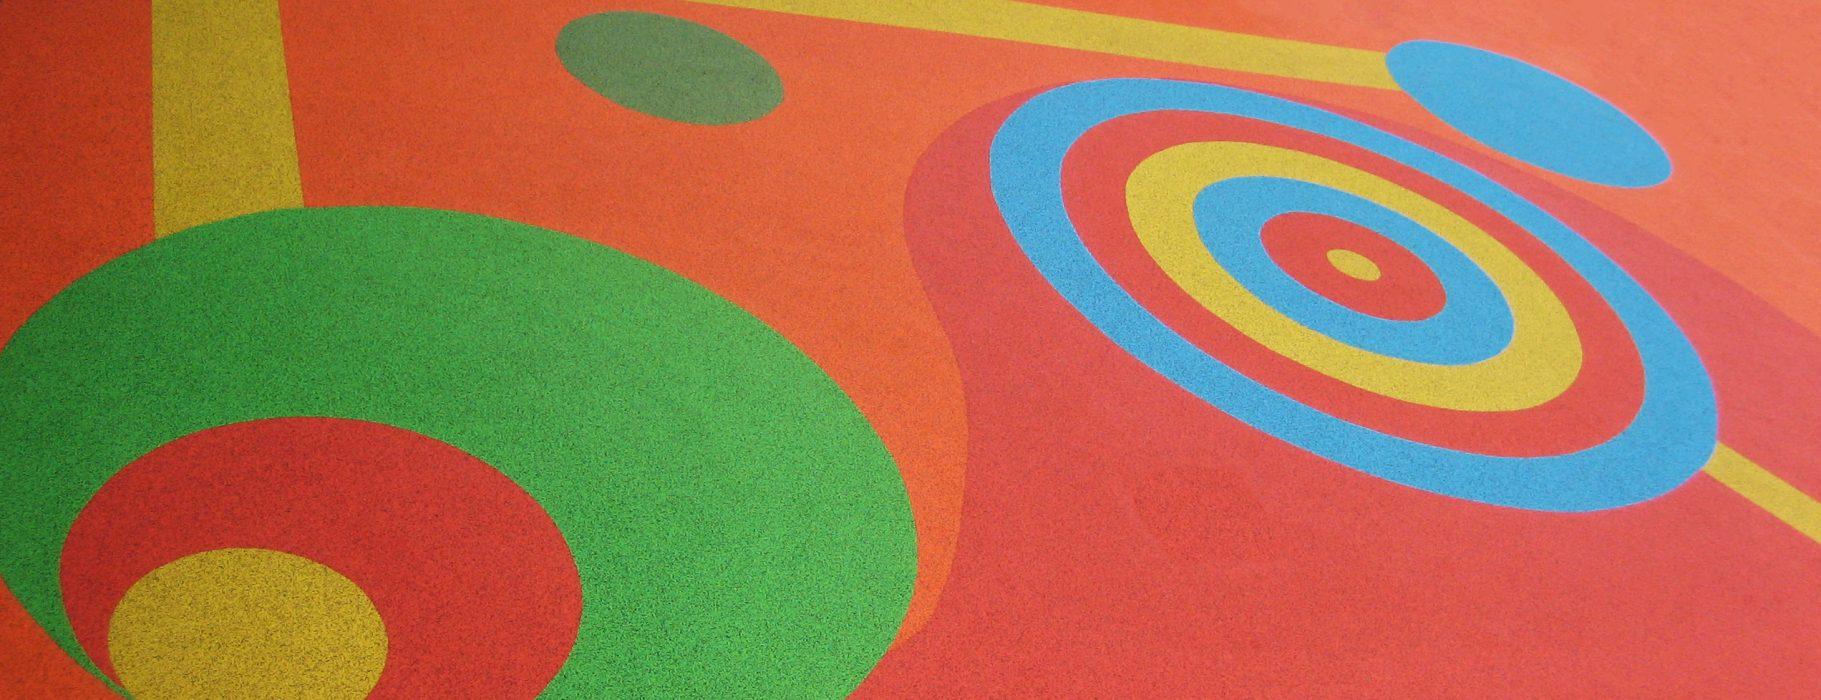 pavimentazione playground epdm